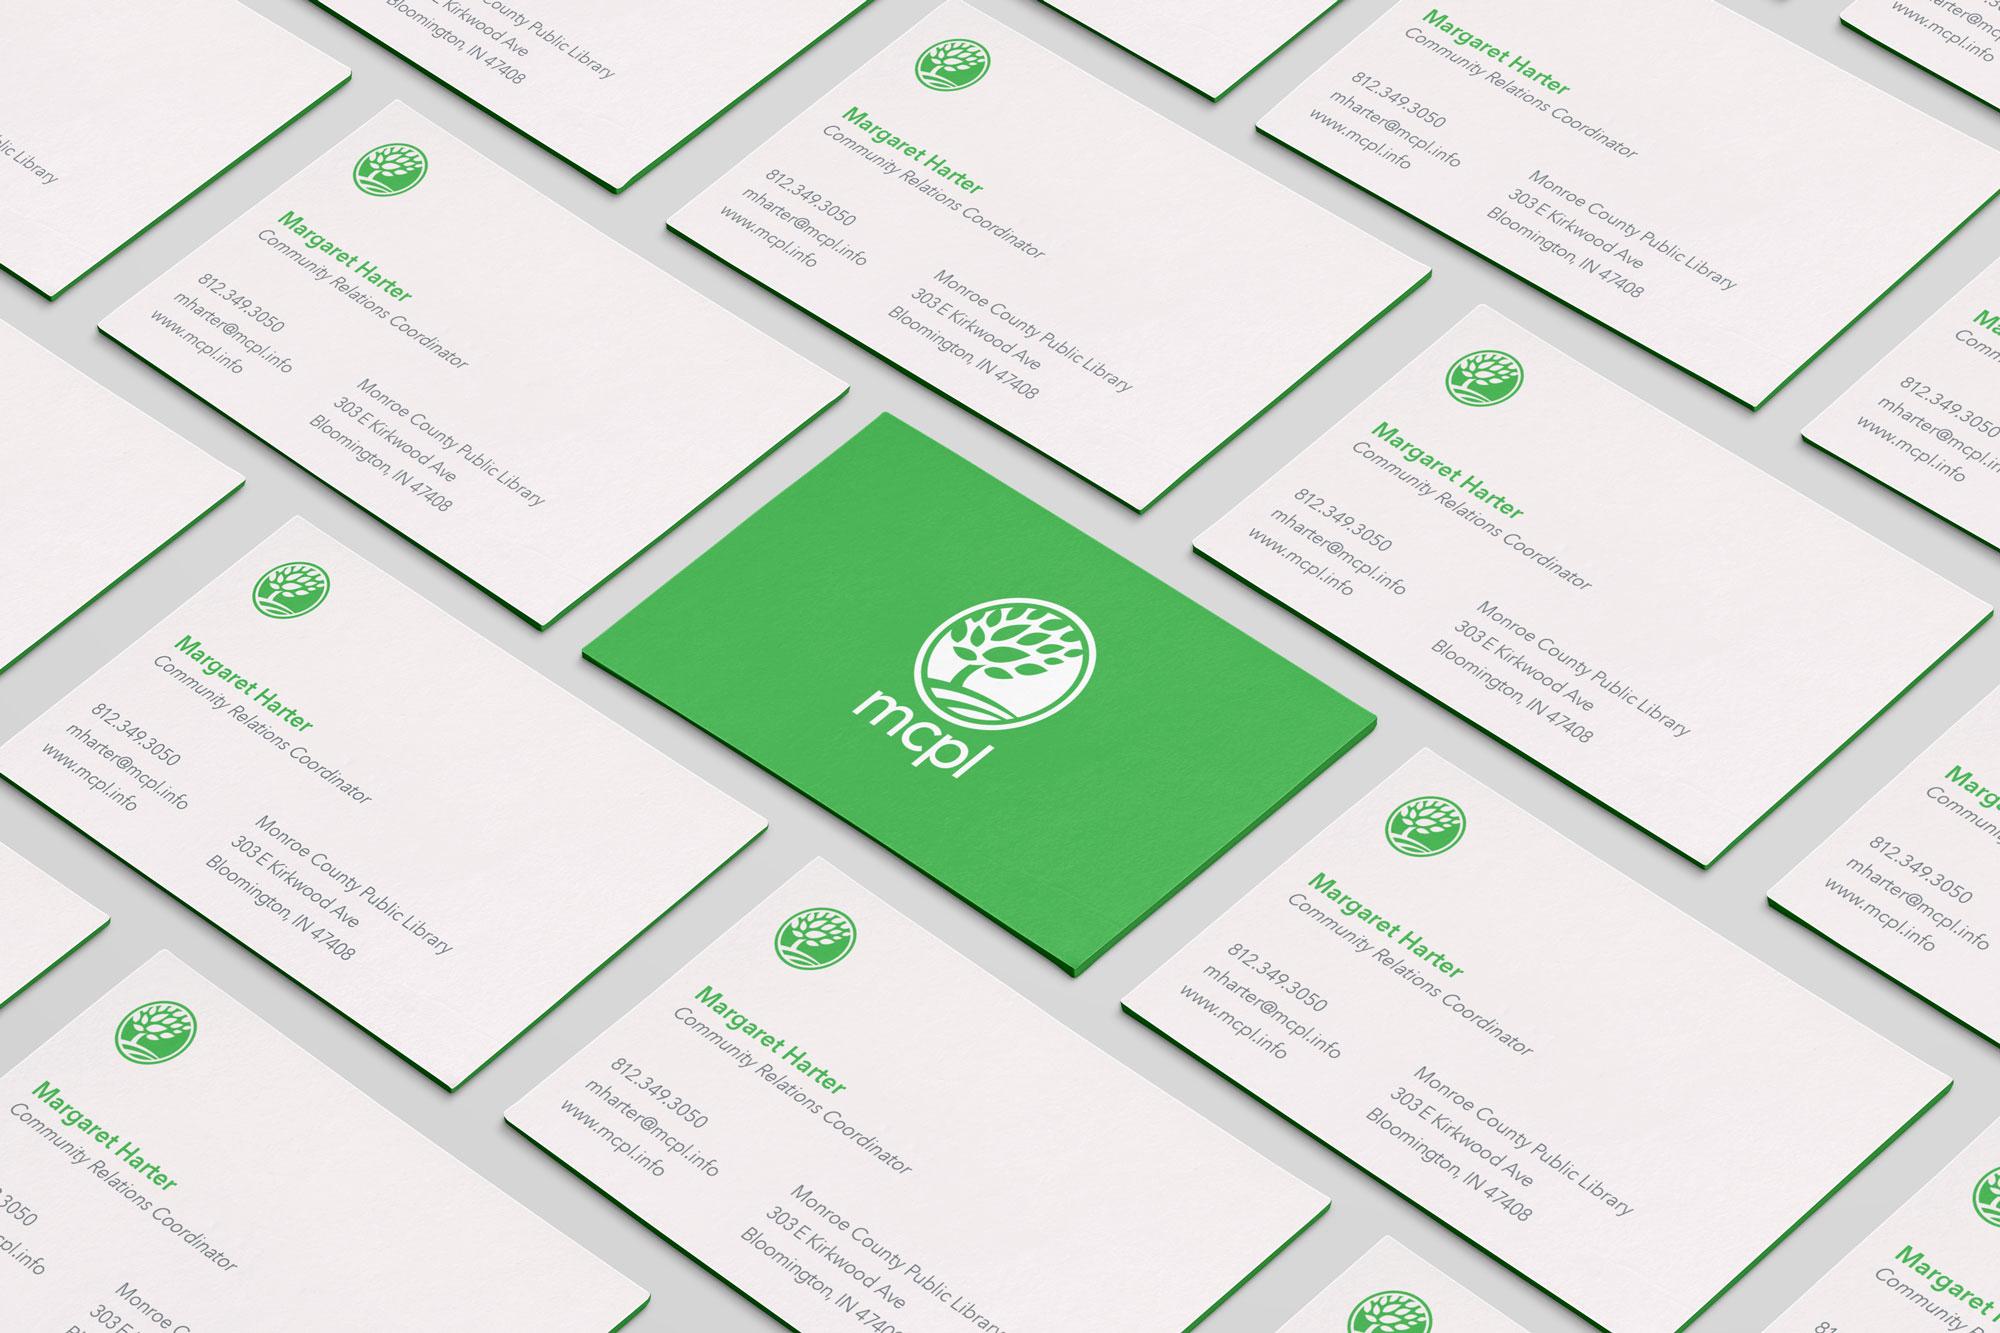 mcpl-business-cards-2.jpg